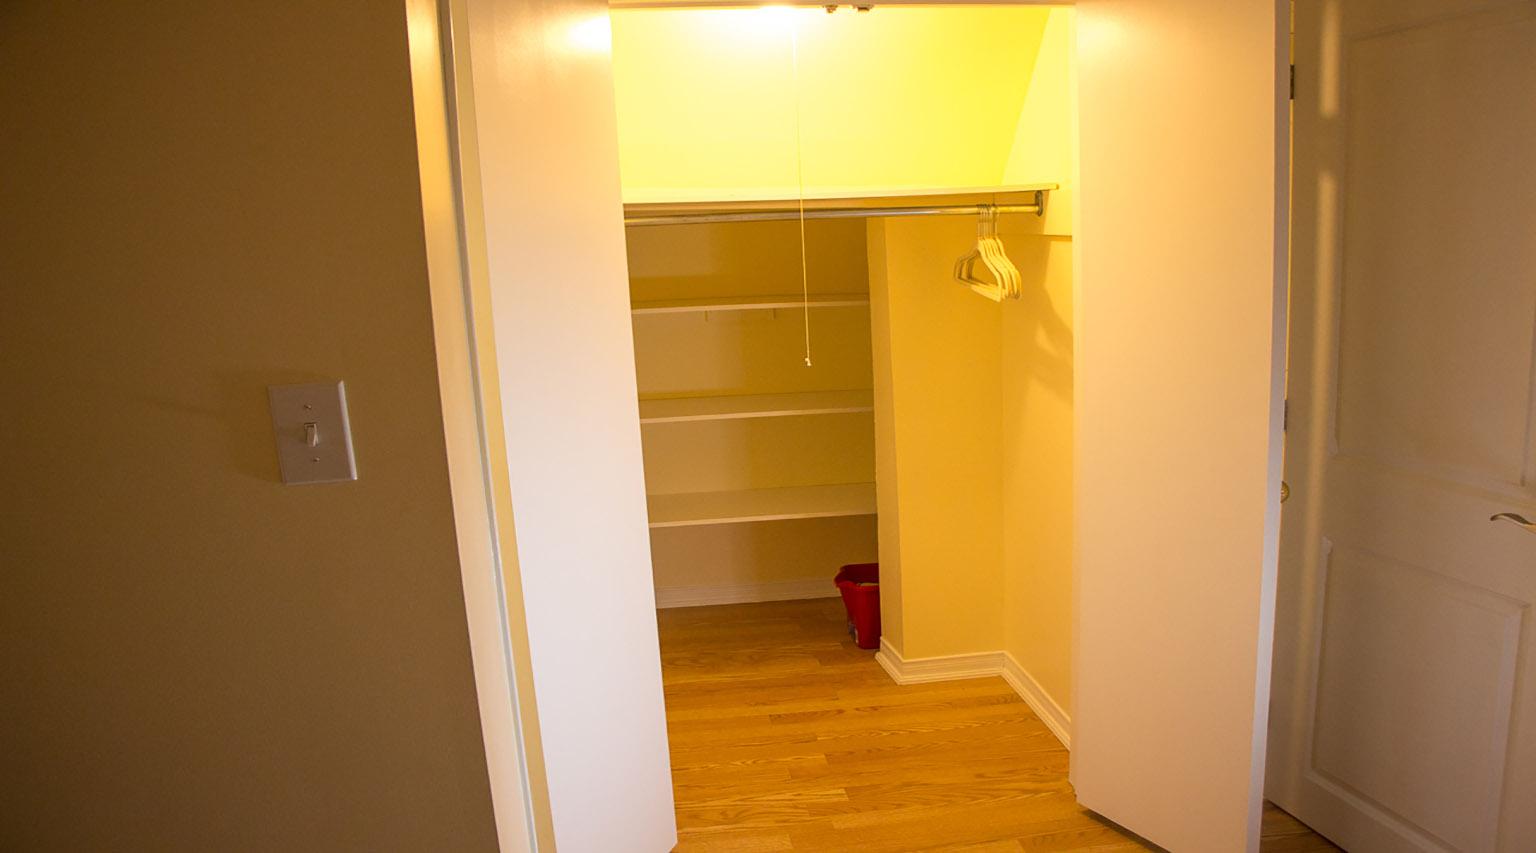 basement apartment in etobicoke toronto for rent. Black Bedroom Furniture Sets. Home Design Ideas